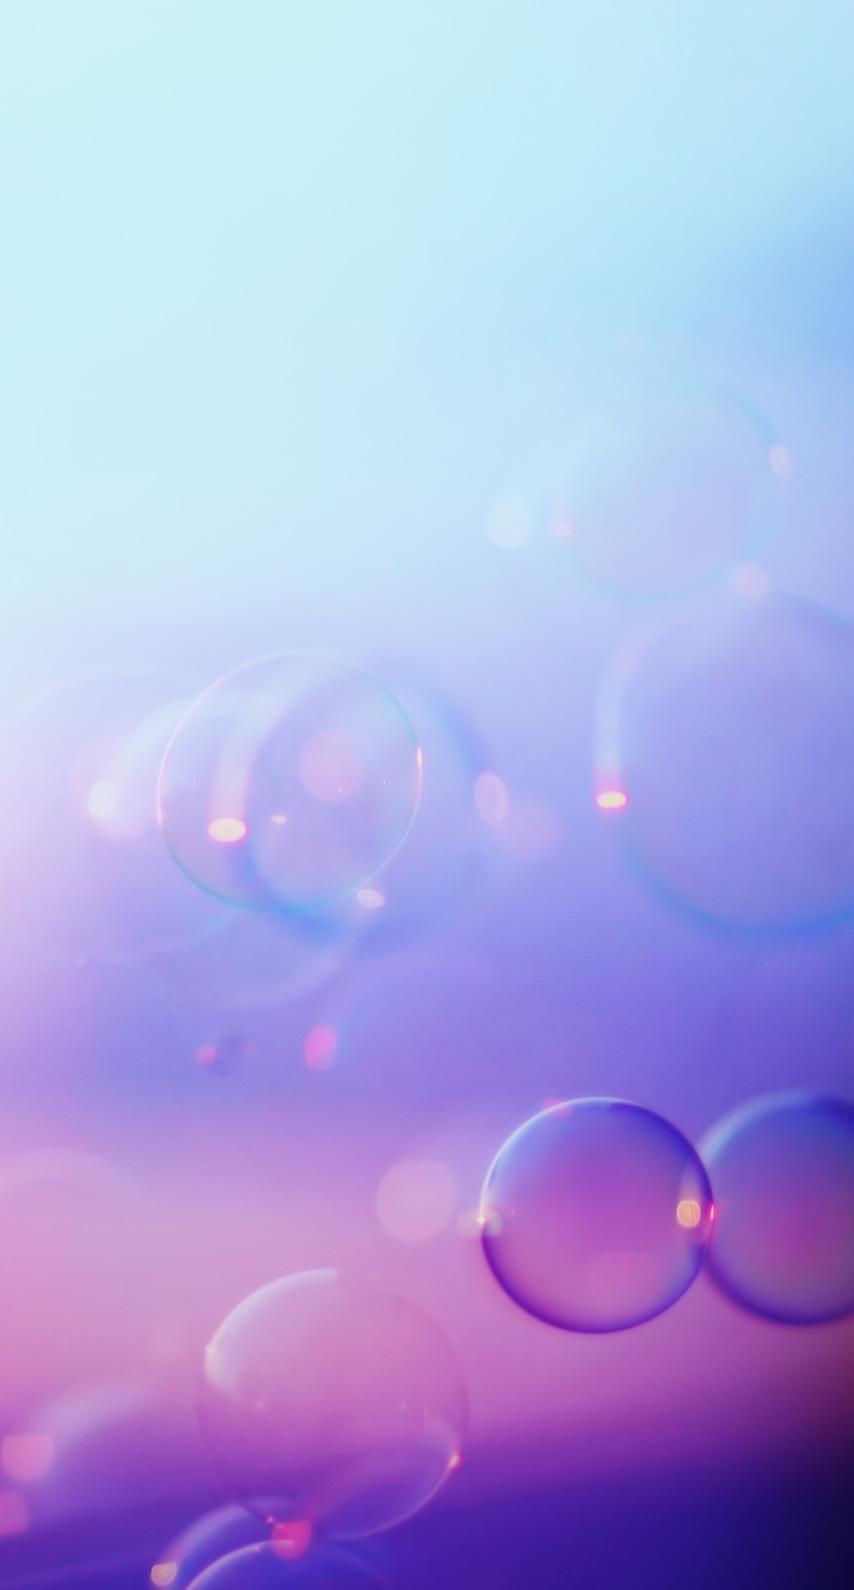 bright, gradient, artistic, art, modern, wave, graphic, bubble, design, background, insubstantial